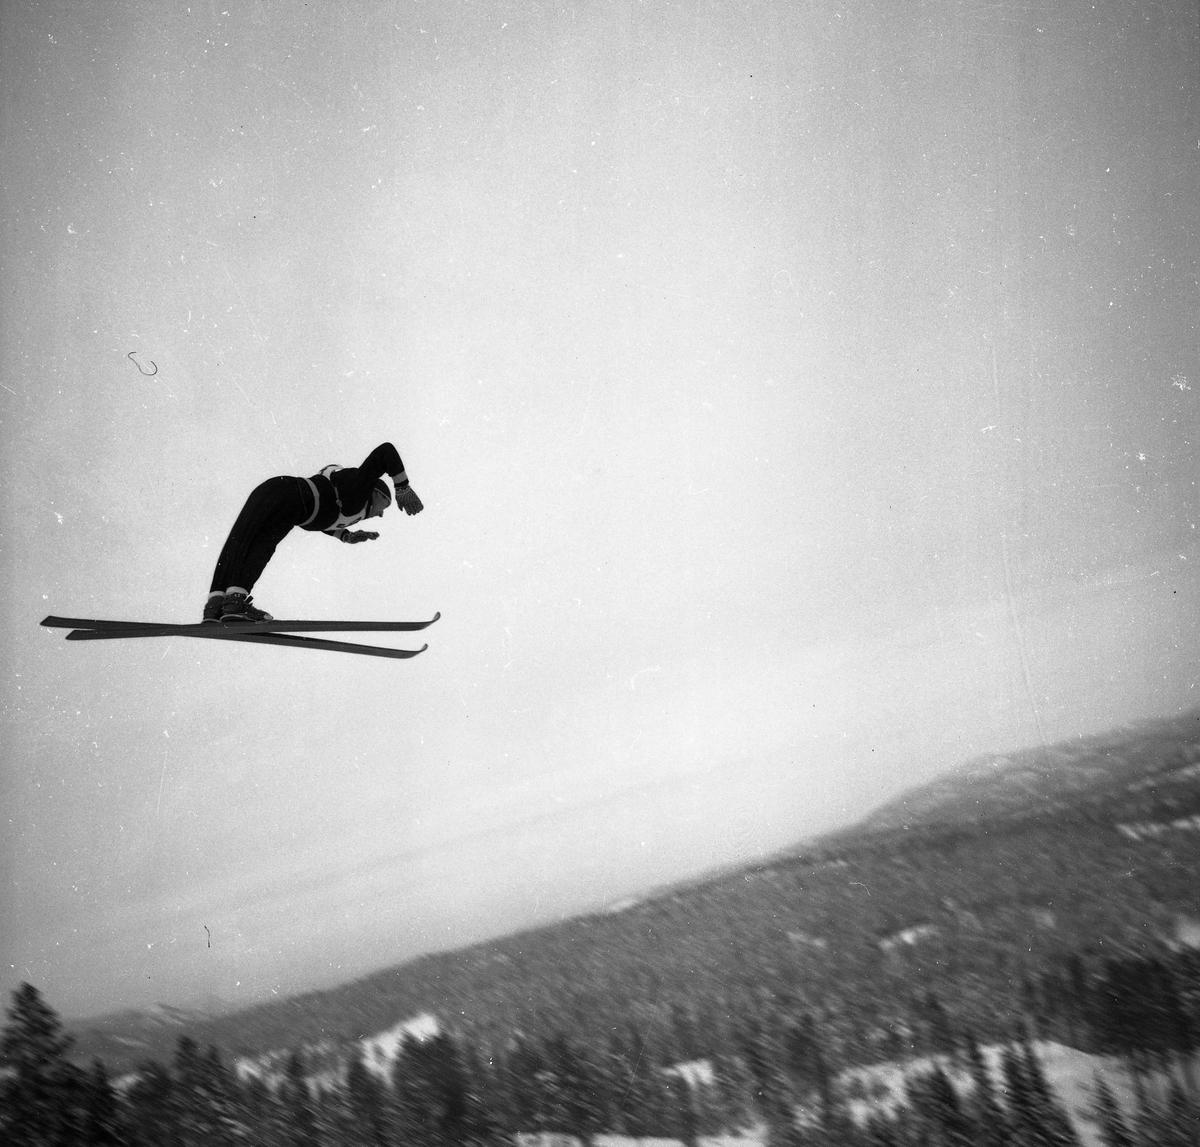 Ski jumper from Kongsberg in action